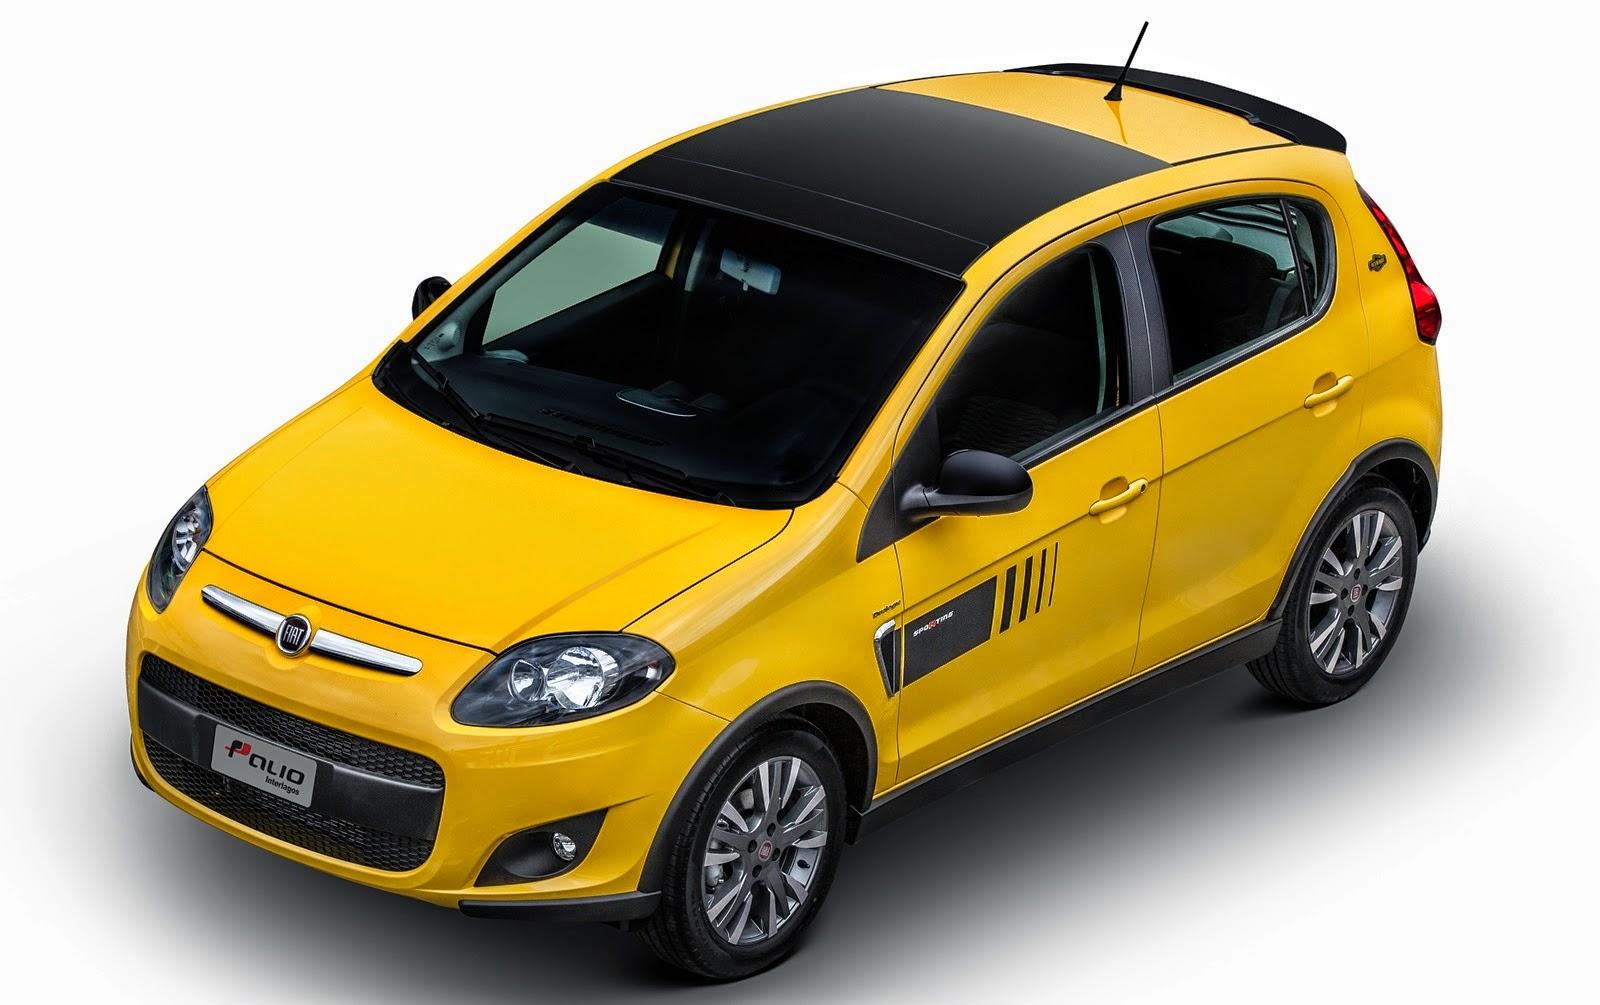 consorcio fiat palio sporting 1.6 motor e torq